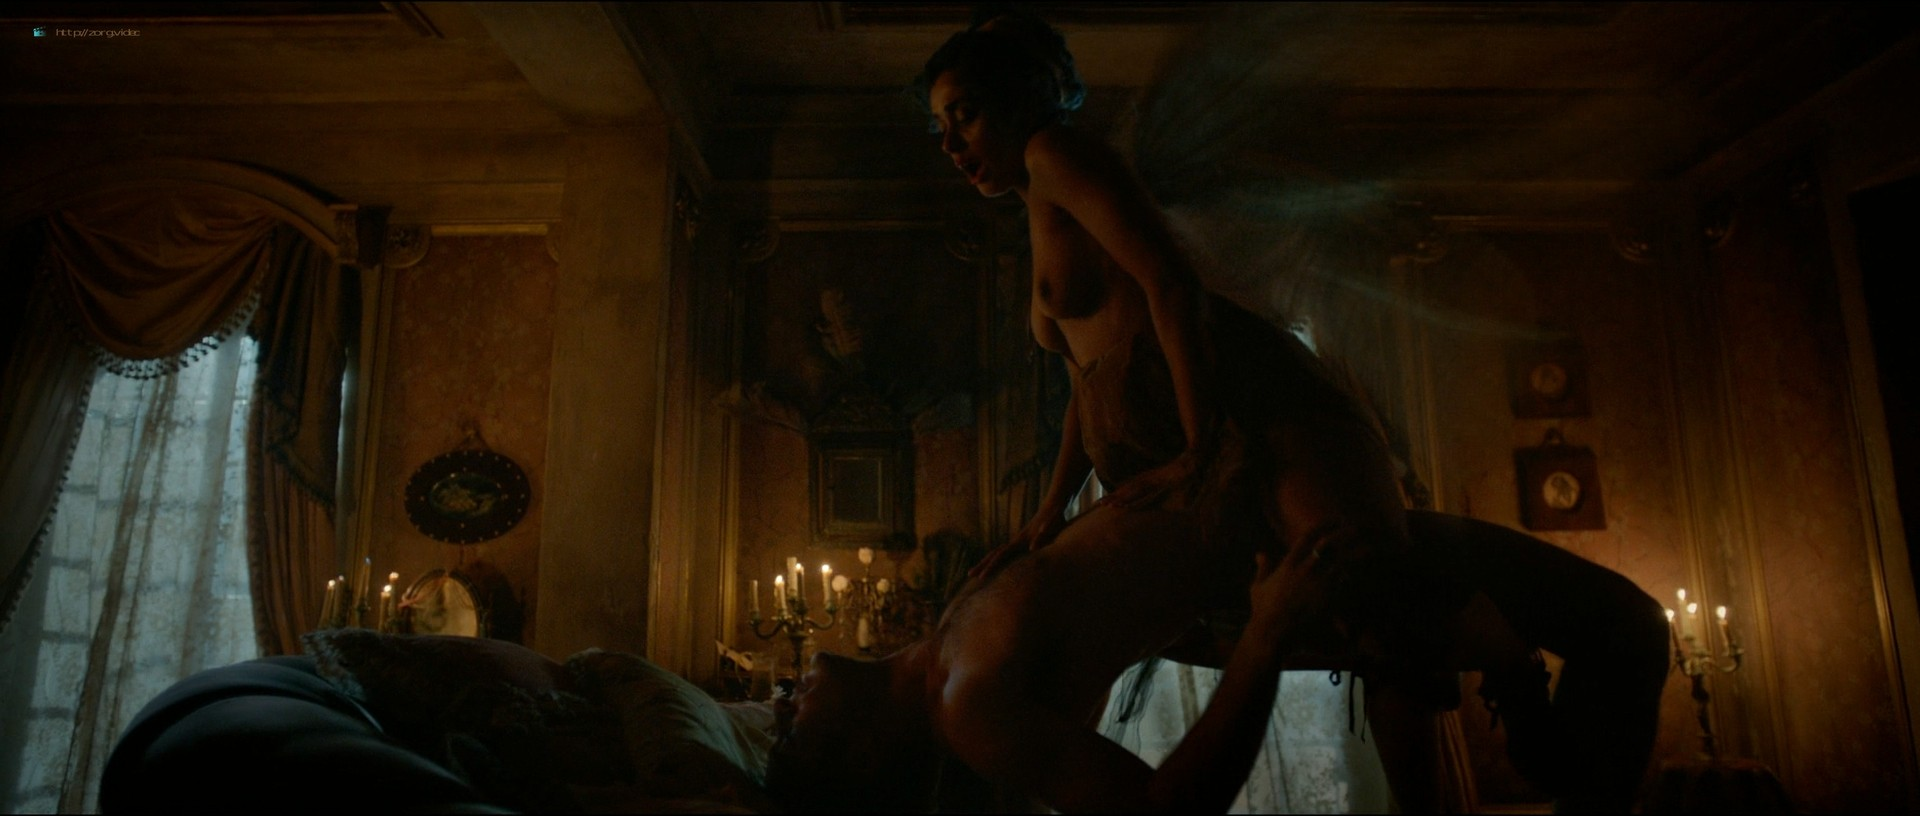 Maeve Dermody nude sex Karla Crome nude too - Carnival Row (2019) s1e1 HD 1080p (4)